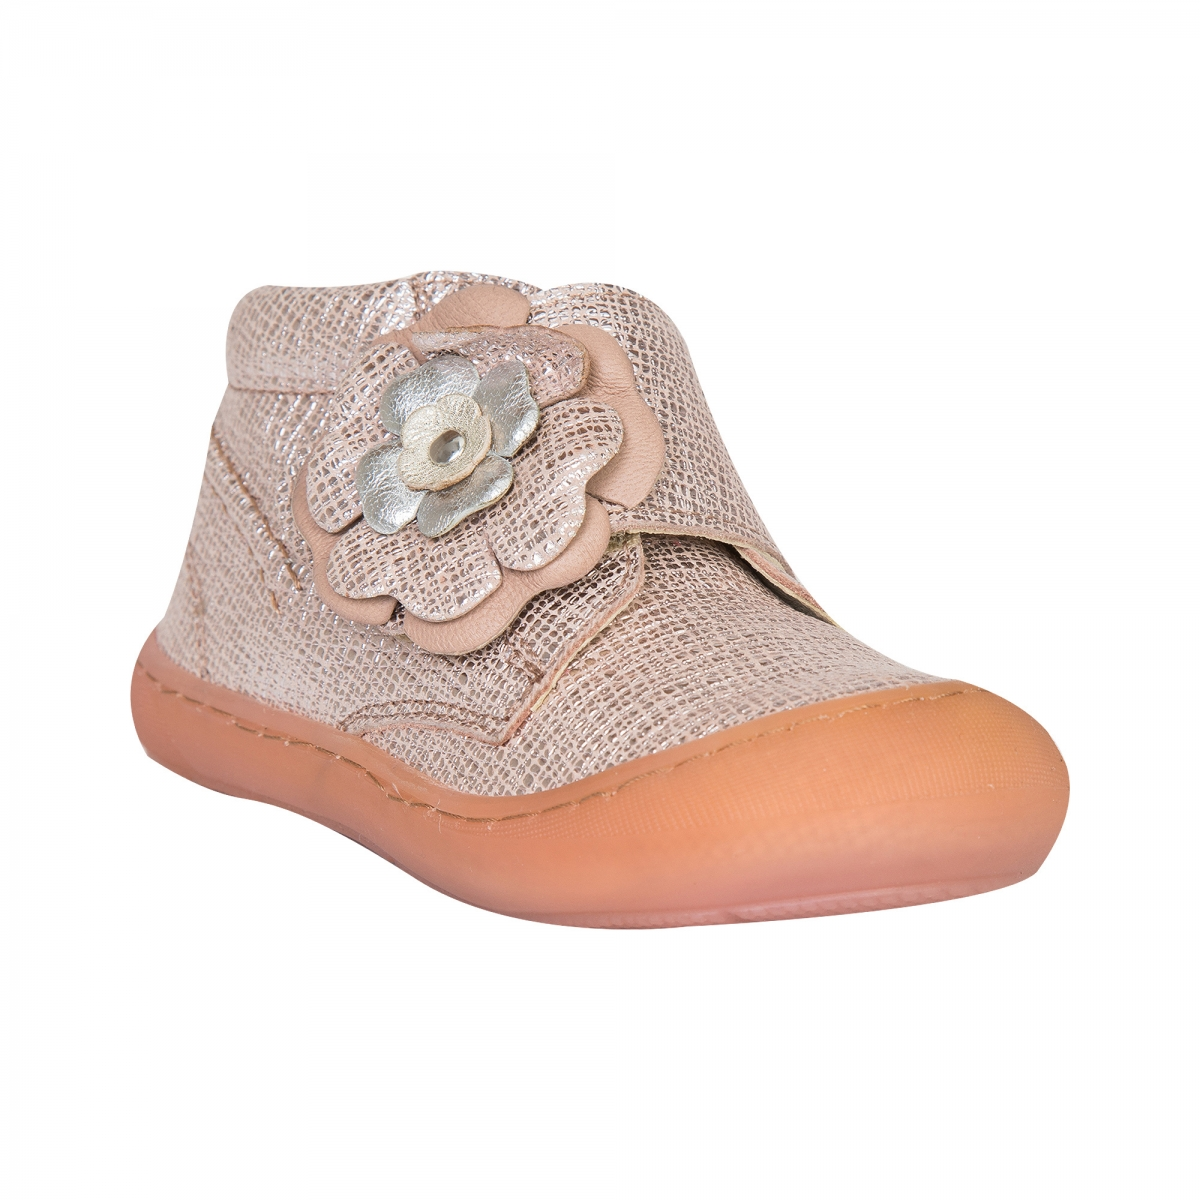 Ghetute fete flexibile din piele pj shoes Edy bronz 18-25